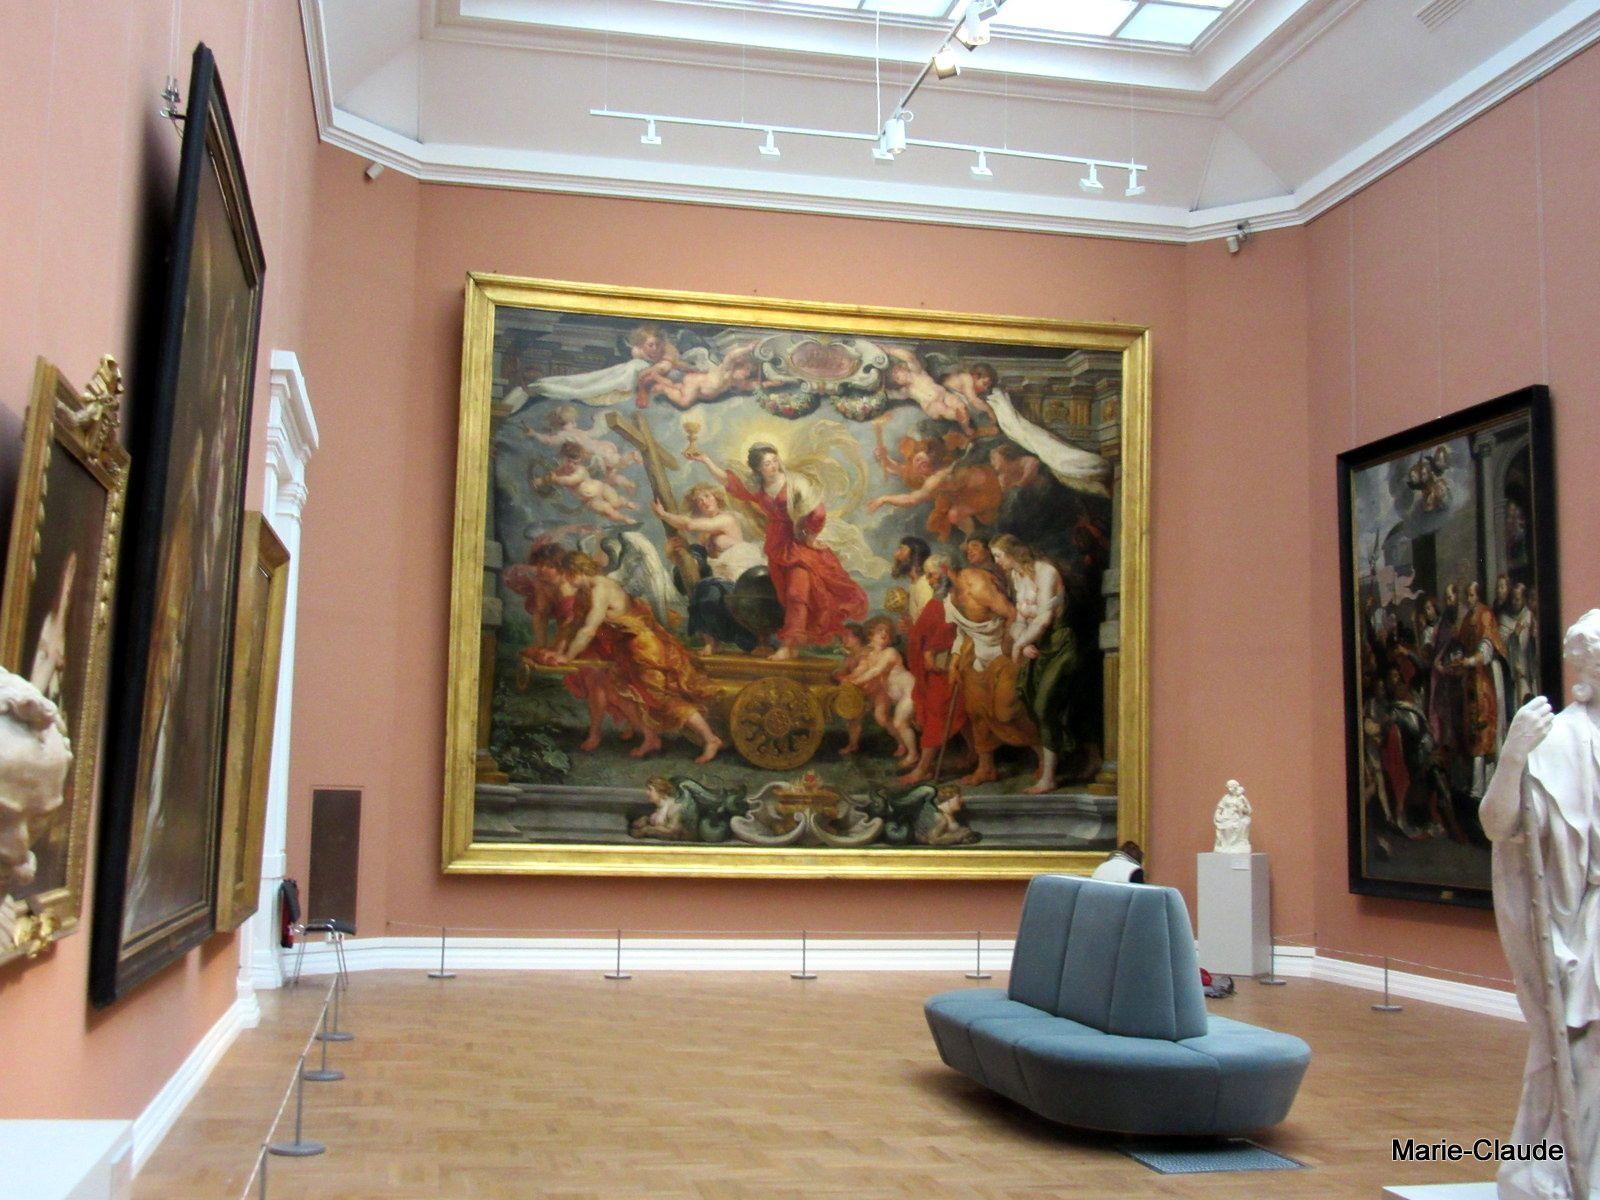 La salle Rubens, maître de la peinture flamande